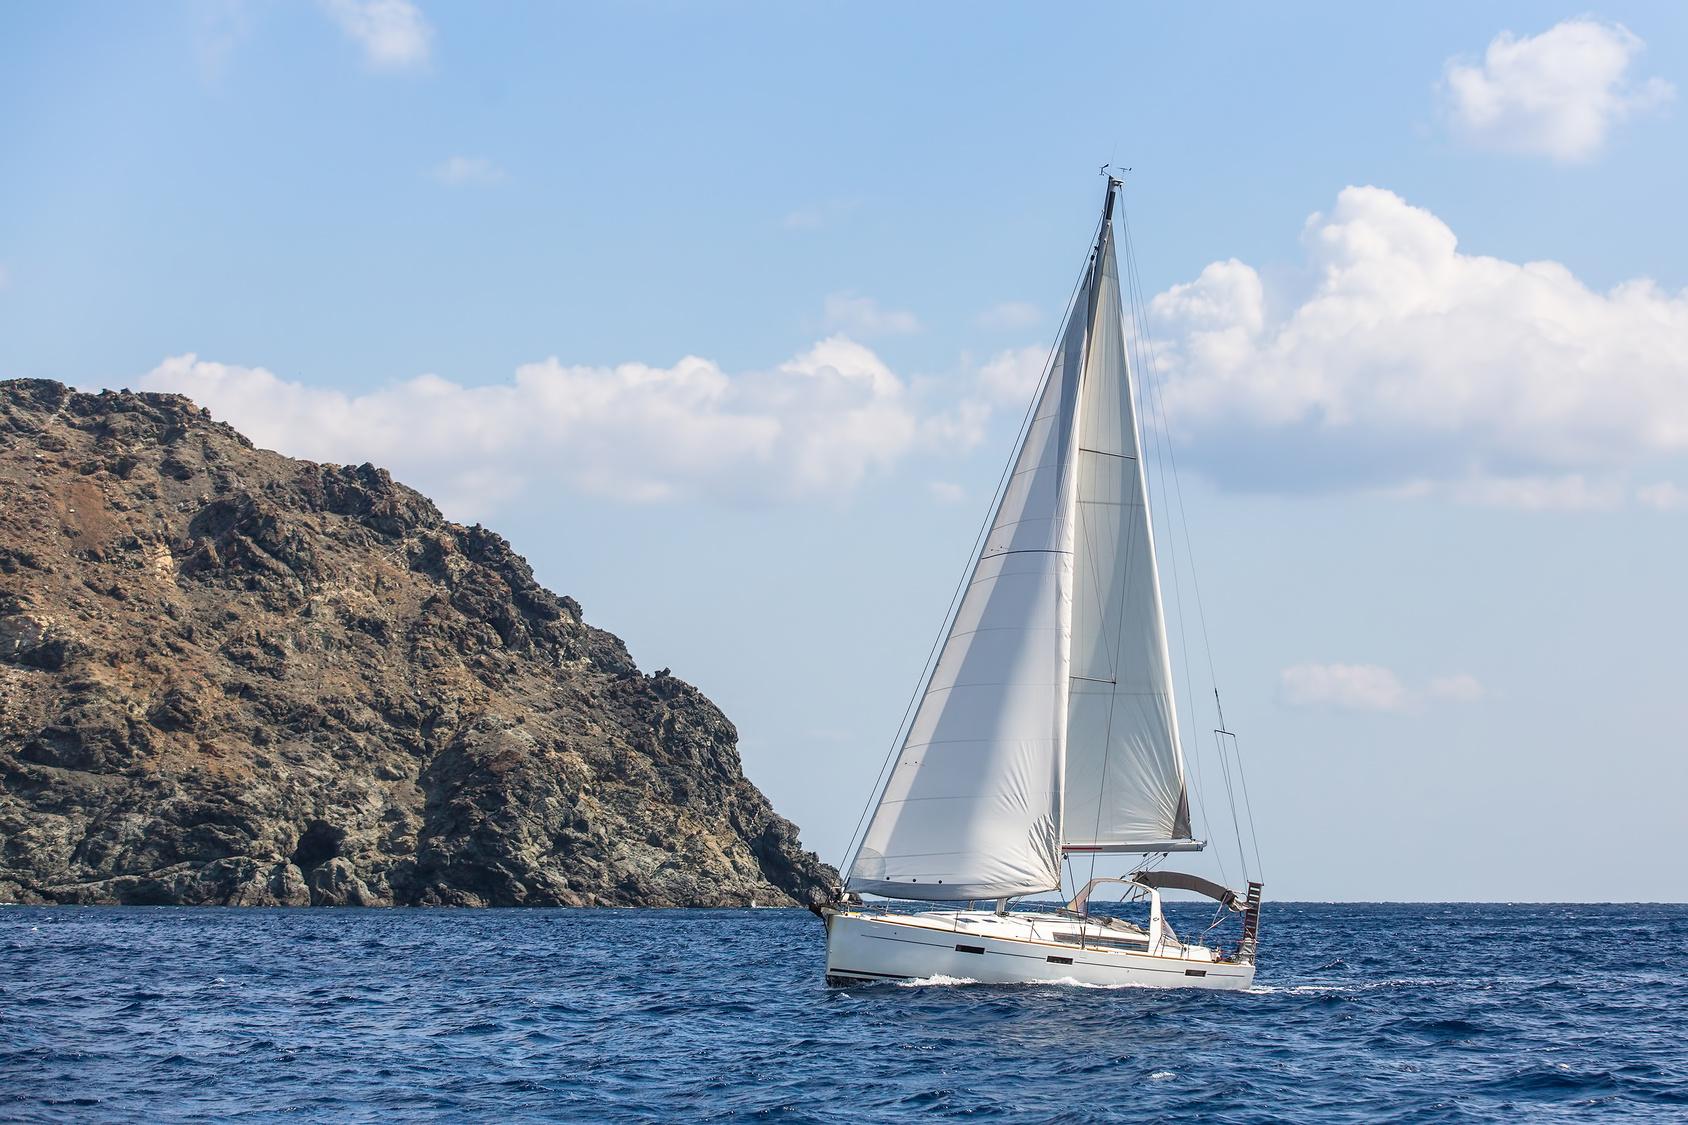 Boats in sailing regatta at Aegean Sea. Luxury yachts.